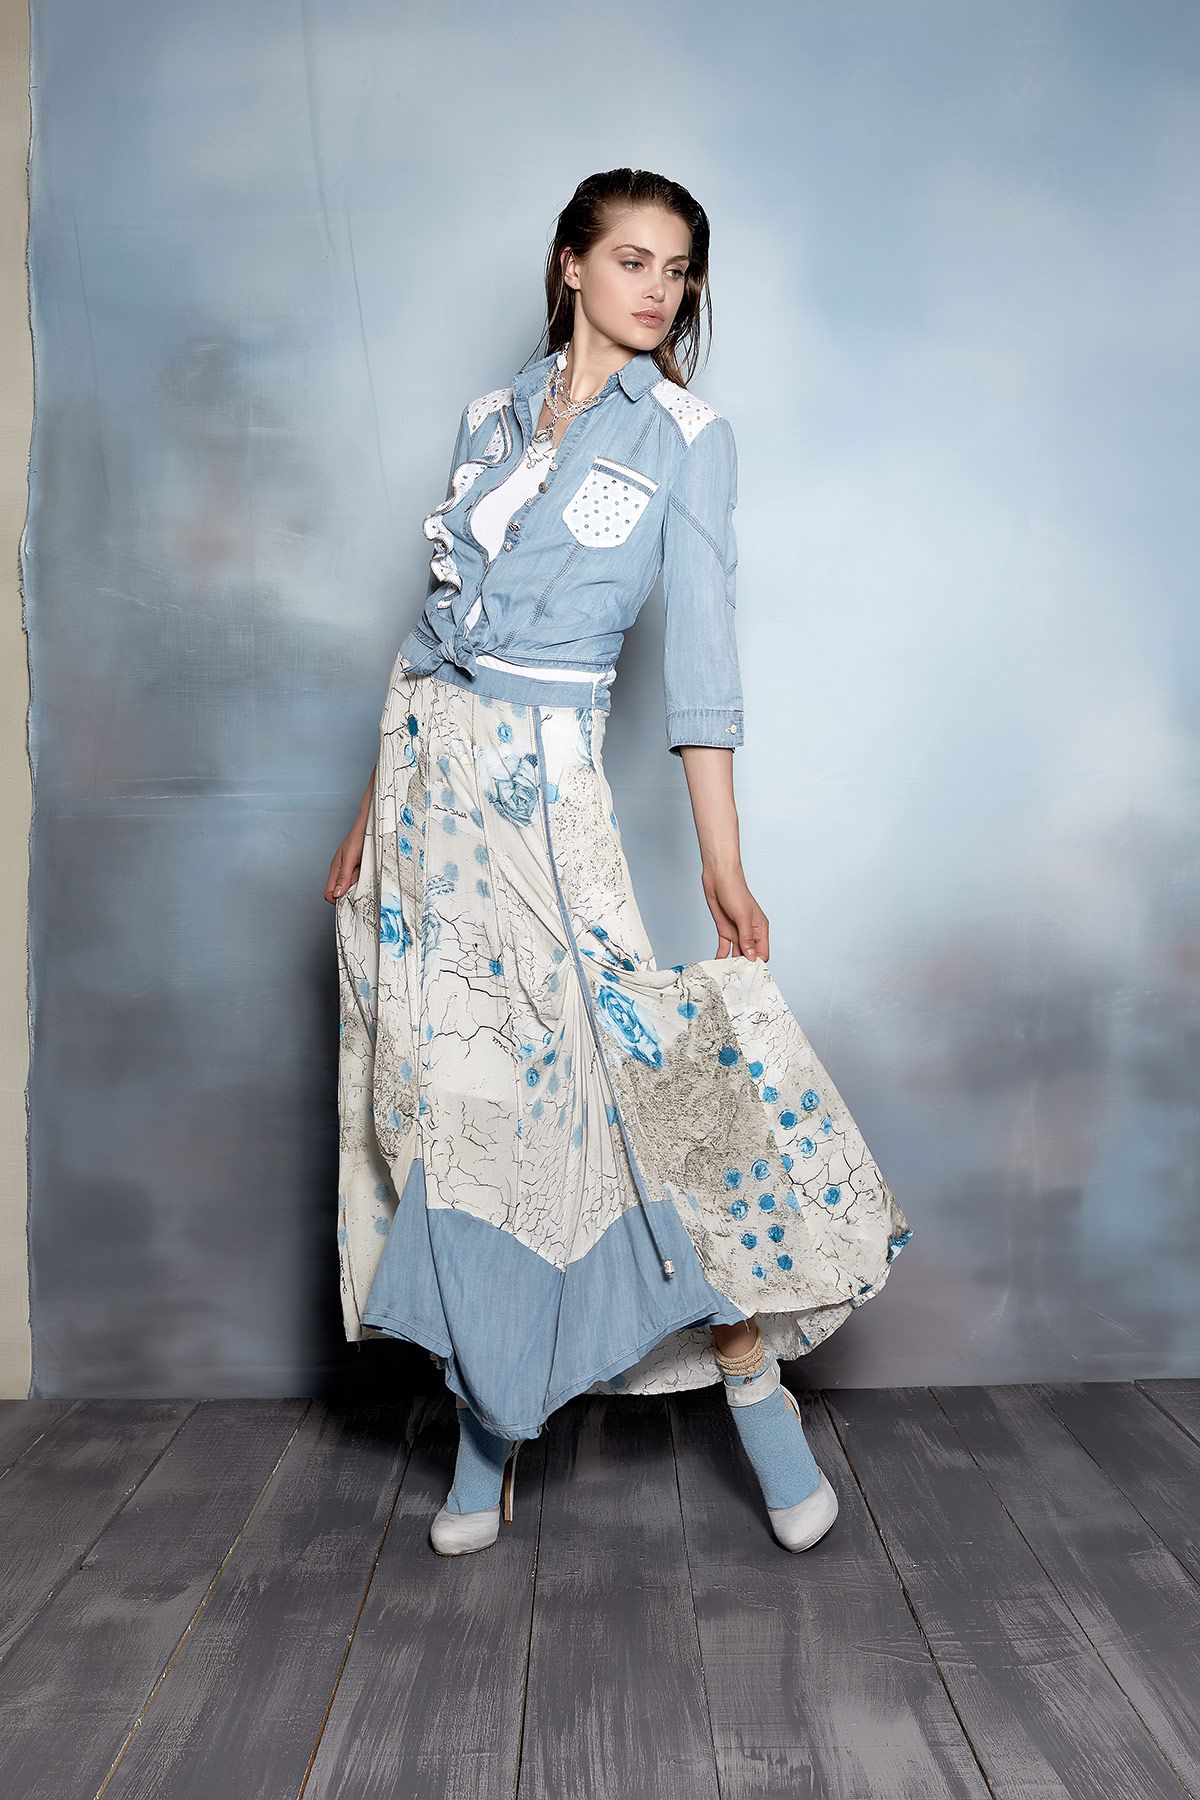 #danieladallavalle #collection #ss16 #elisacavaletti #blouse #top #skirt #socks #necklace #shoes #blue #lightblue #white #fantasy